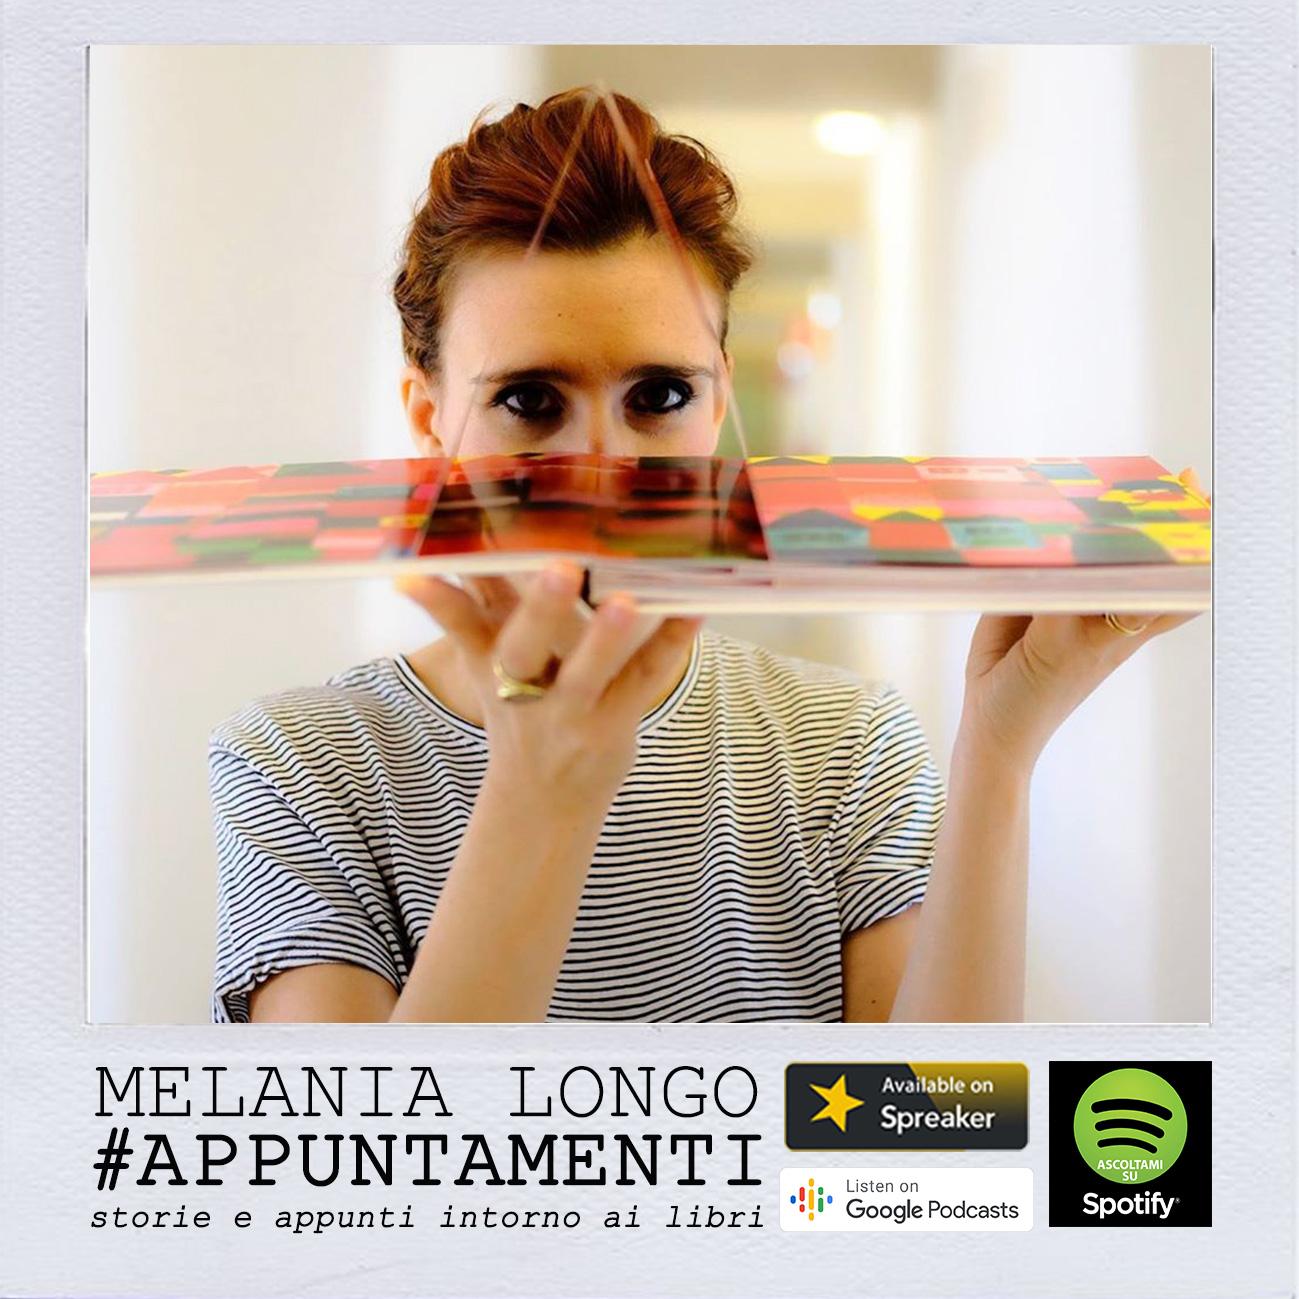 Melania Longo Podcast Appuntamenti